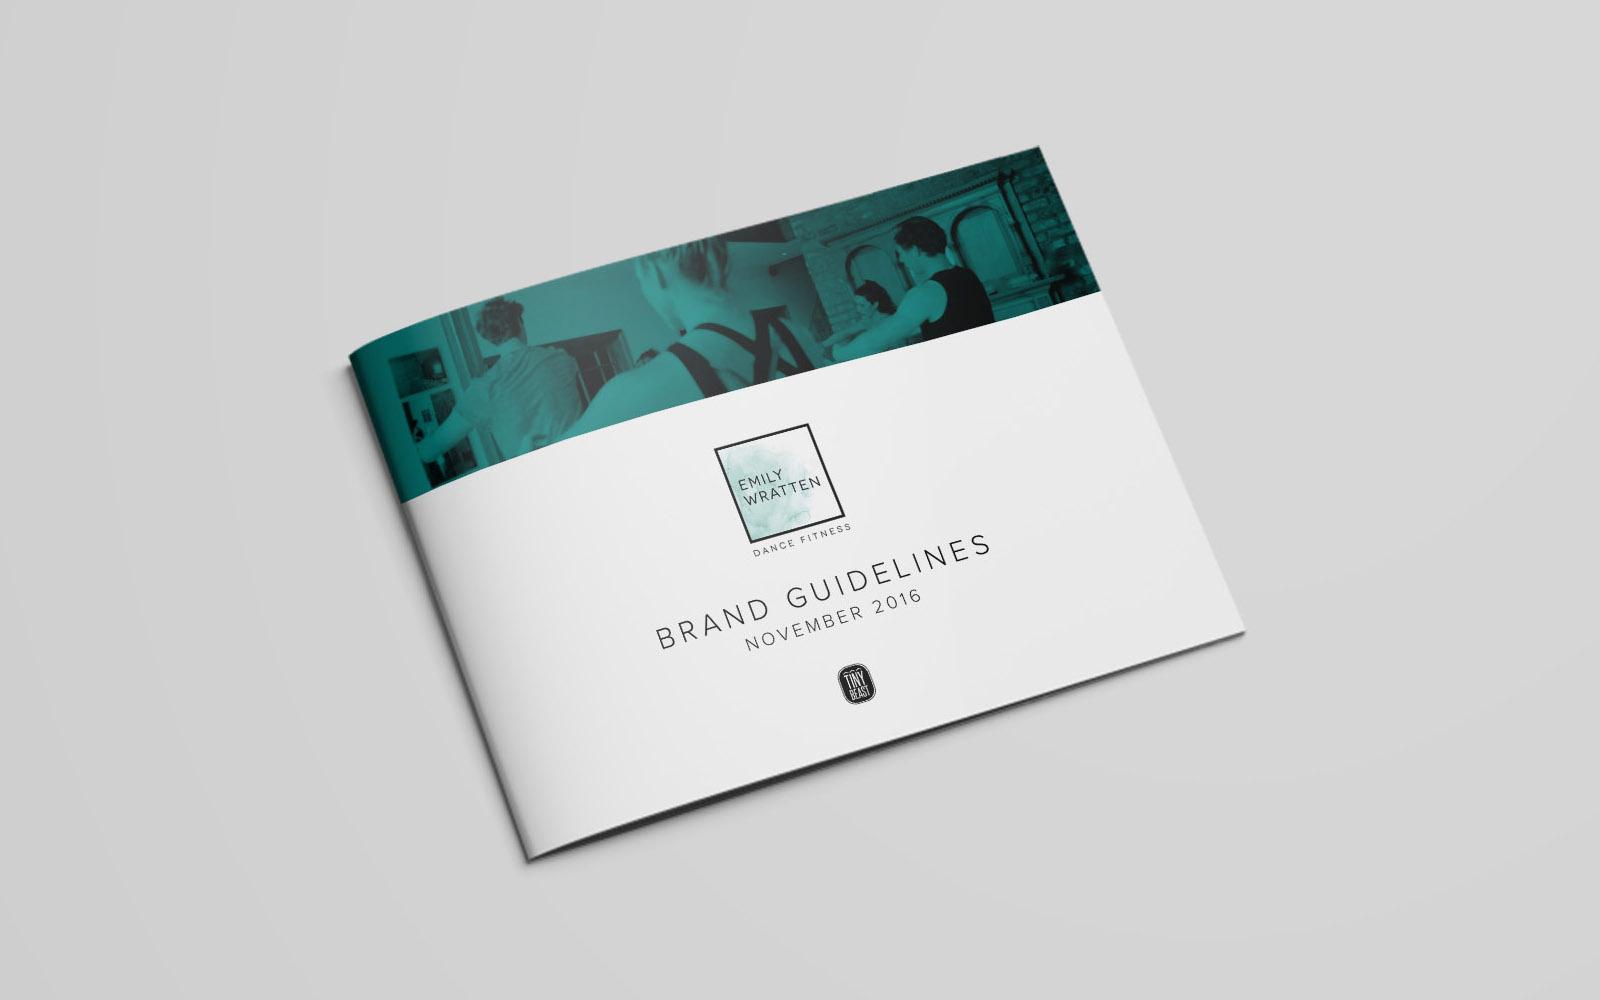 tinybeastdesign-emilywrattendancefitness-guidesline1